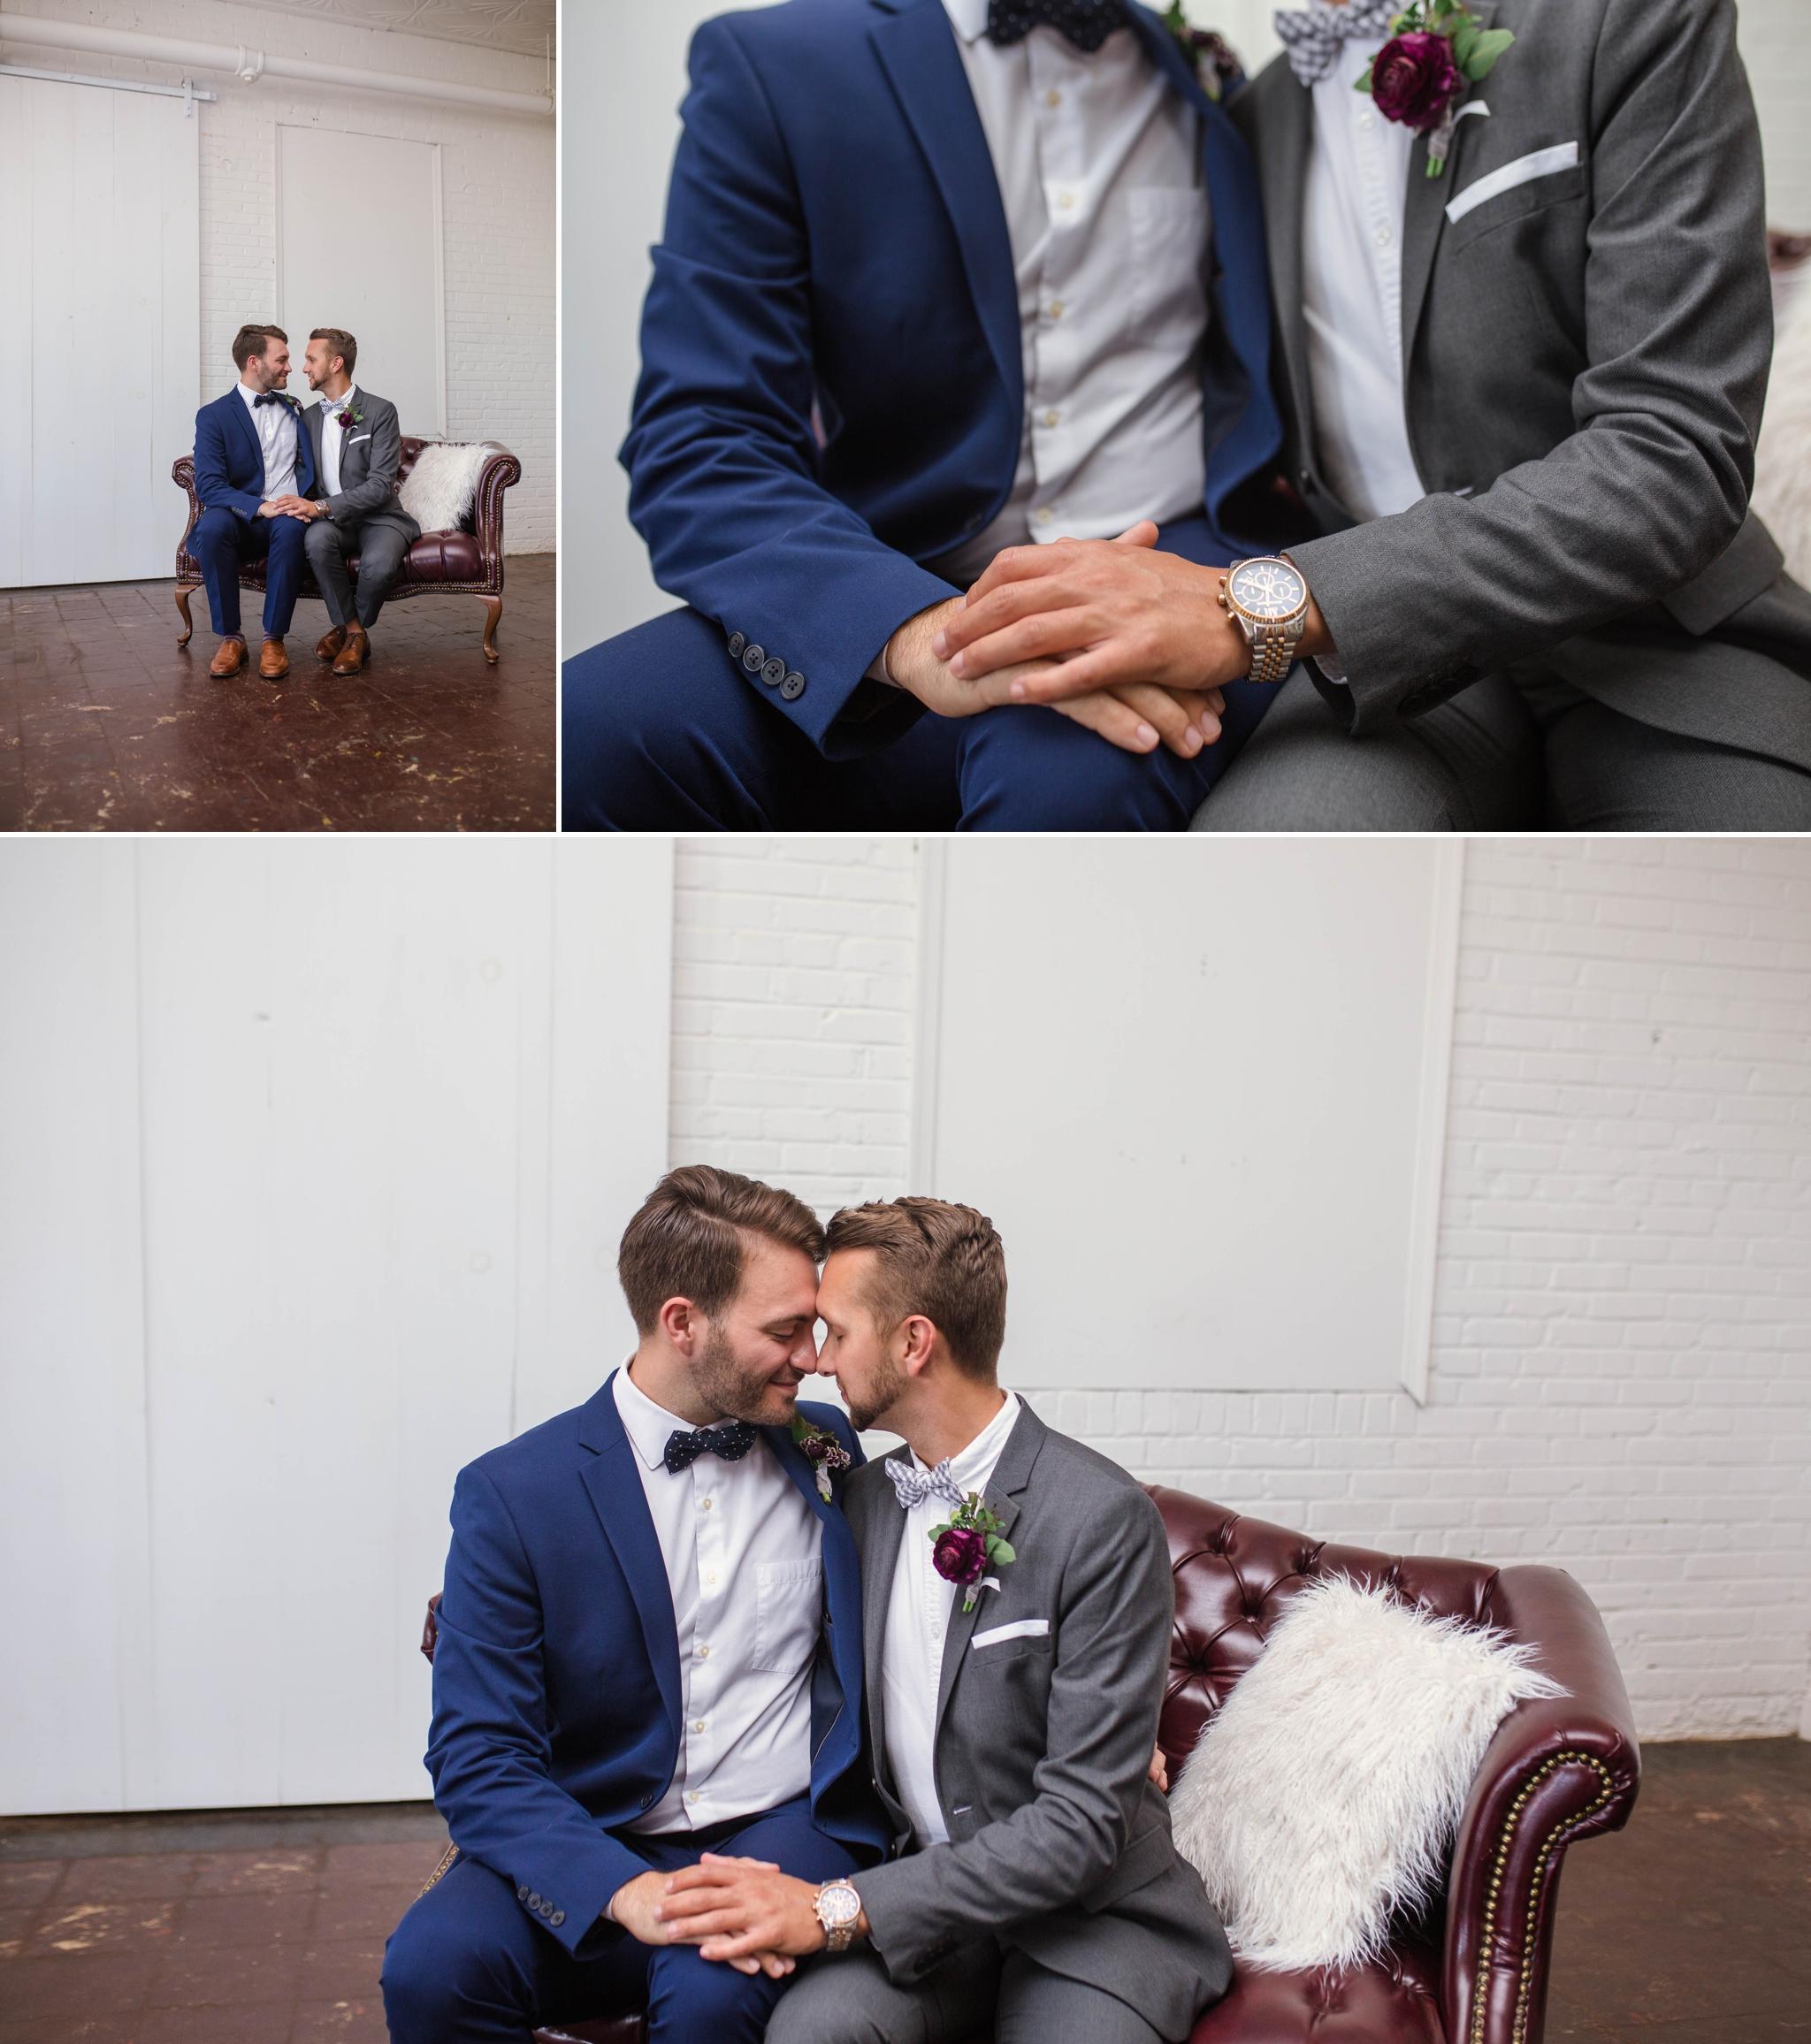 Gay and Lesbian friendly Wedding Photographer in Raleigh North Carolina - Johanna Dye Photography